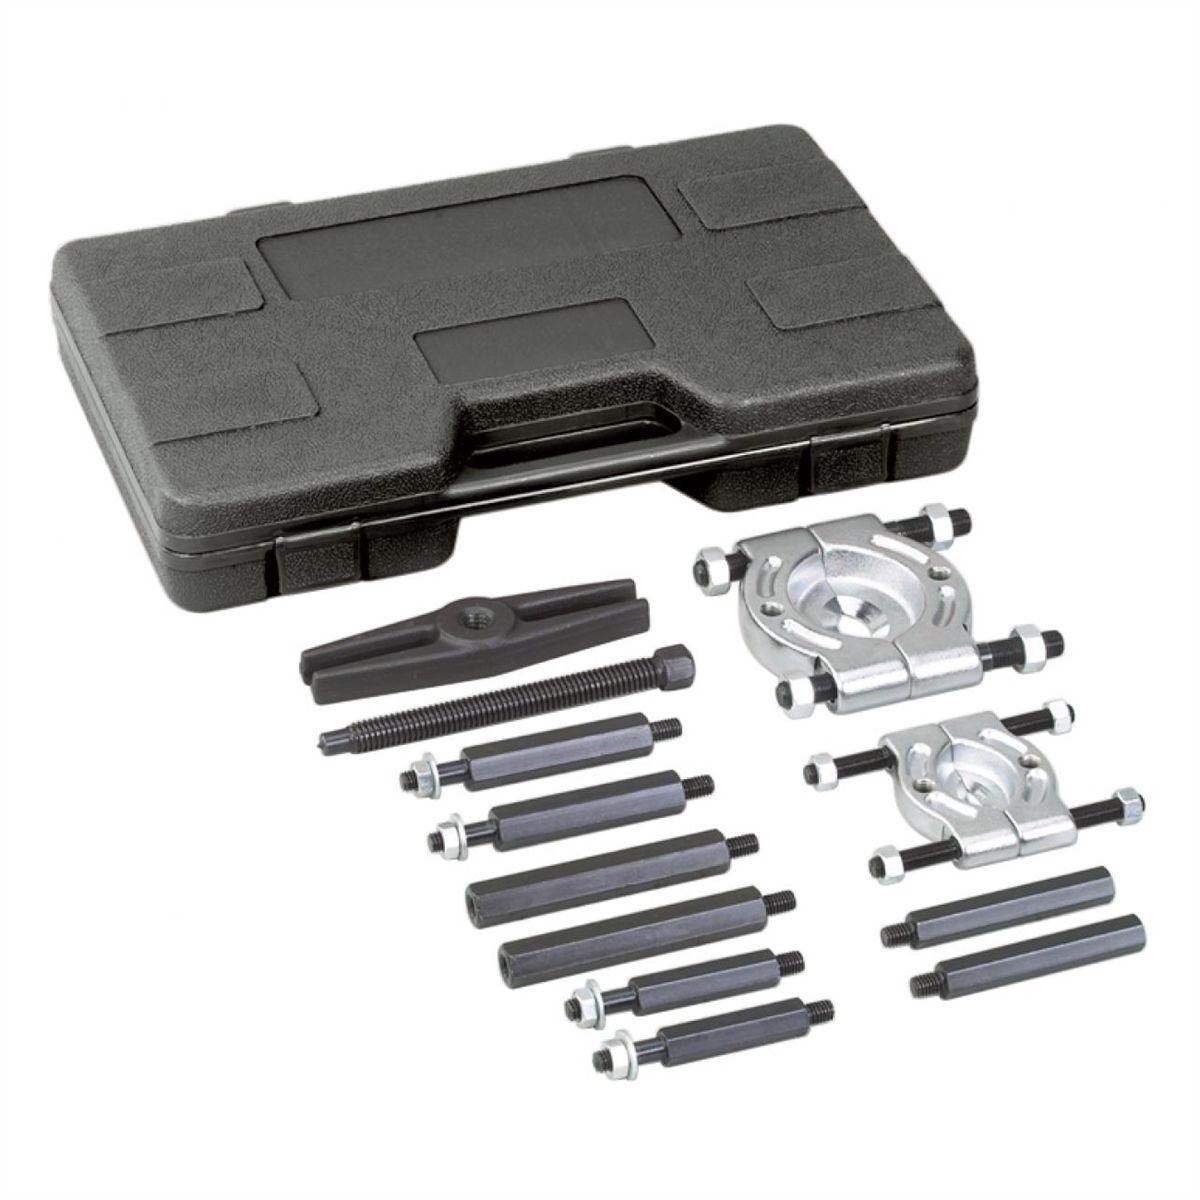 OTC 4518 Stinger 5-Ton Bar-Type Puller/Bearing Separator Set OTC4518 ...